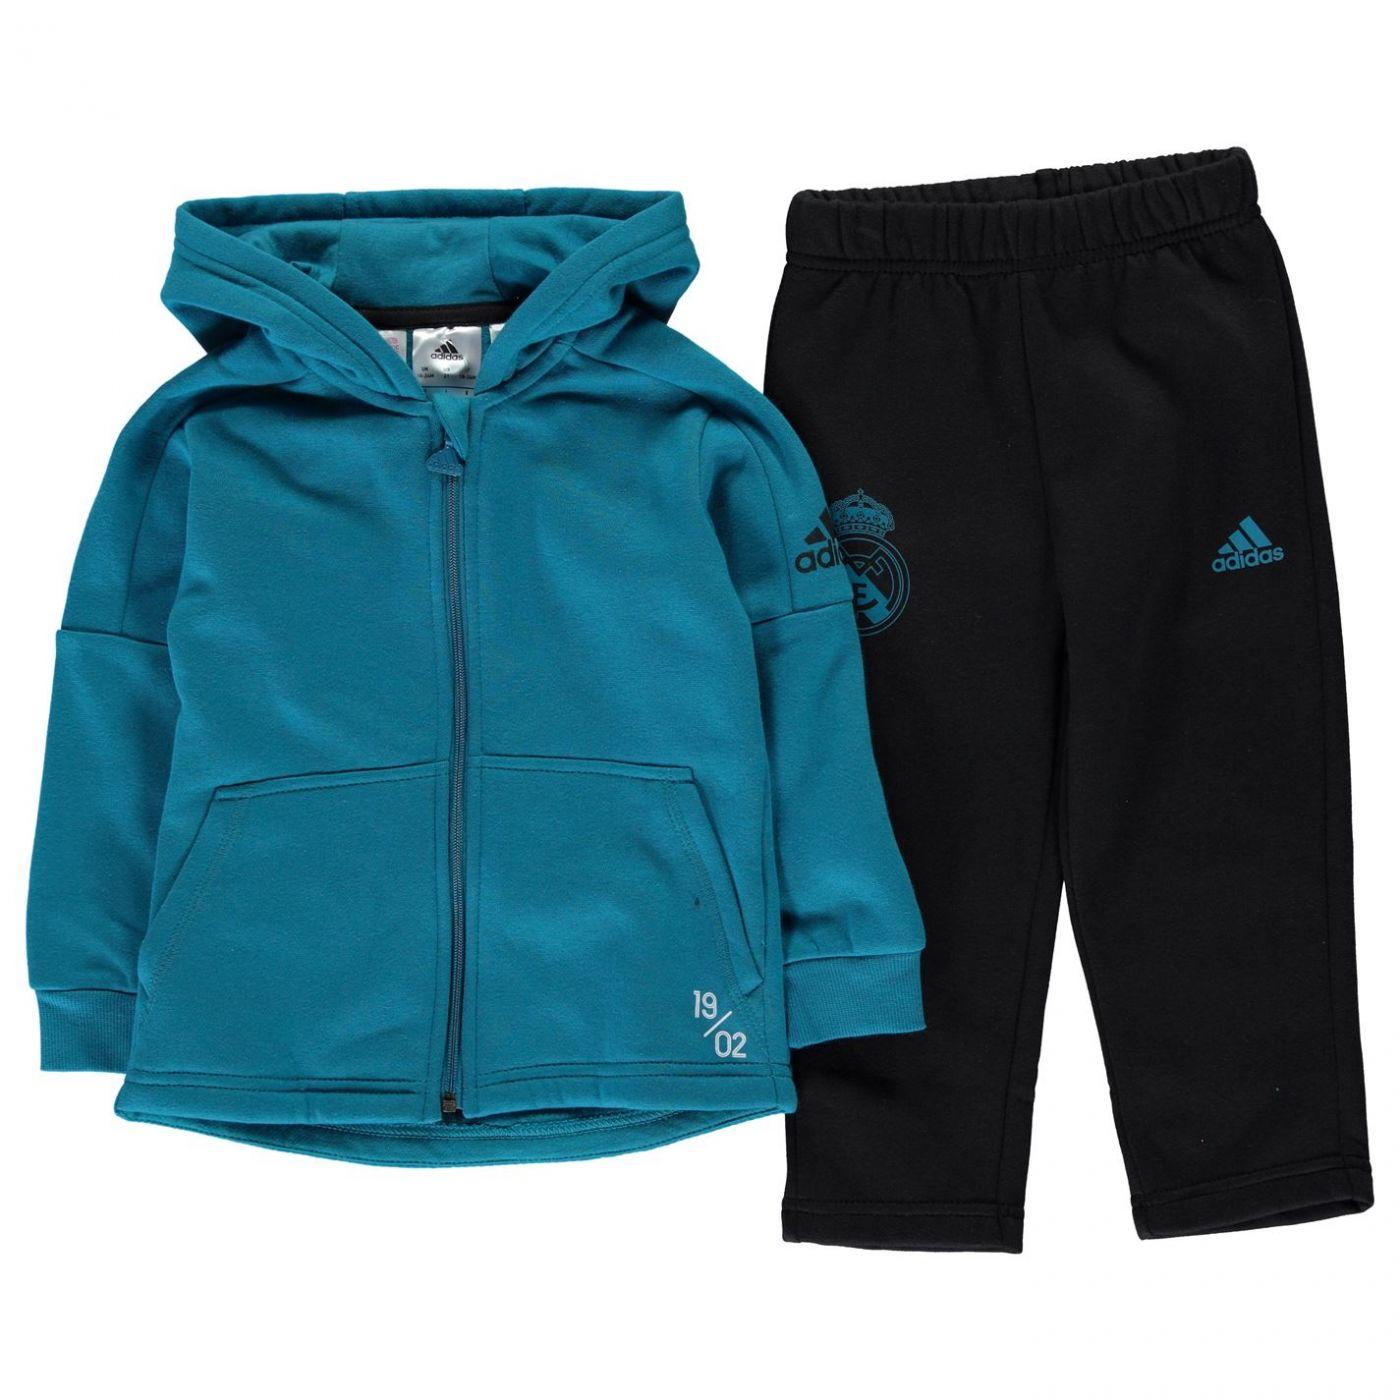 518b4b1668e58 adidas Real Madrid Jog Set Infant Boys - FACTCOOL